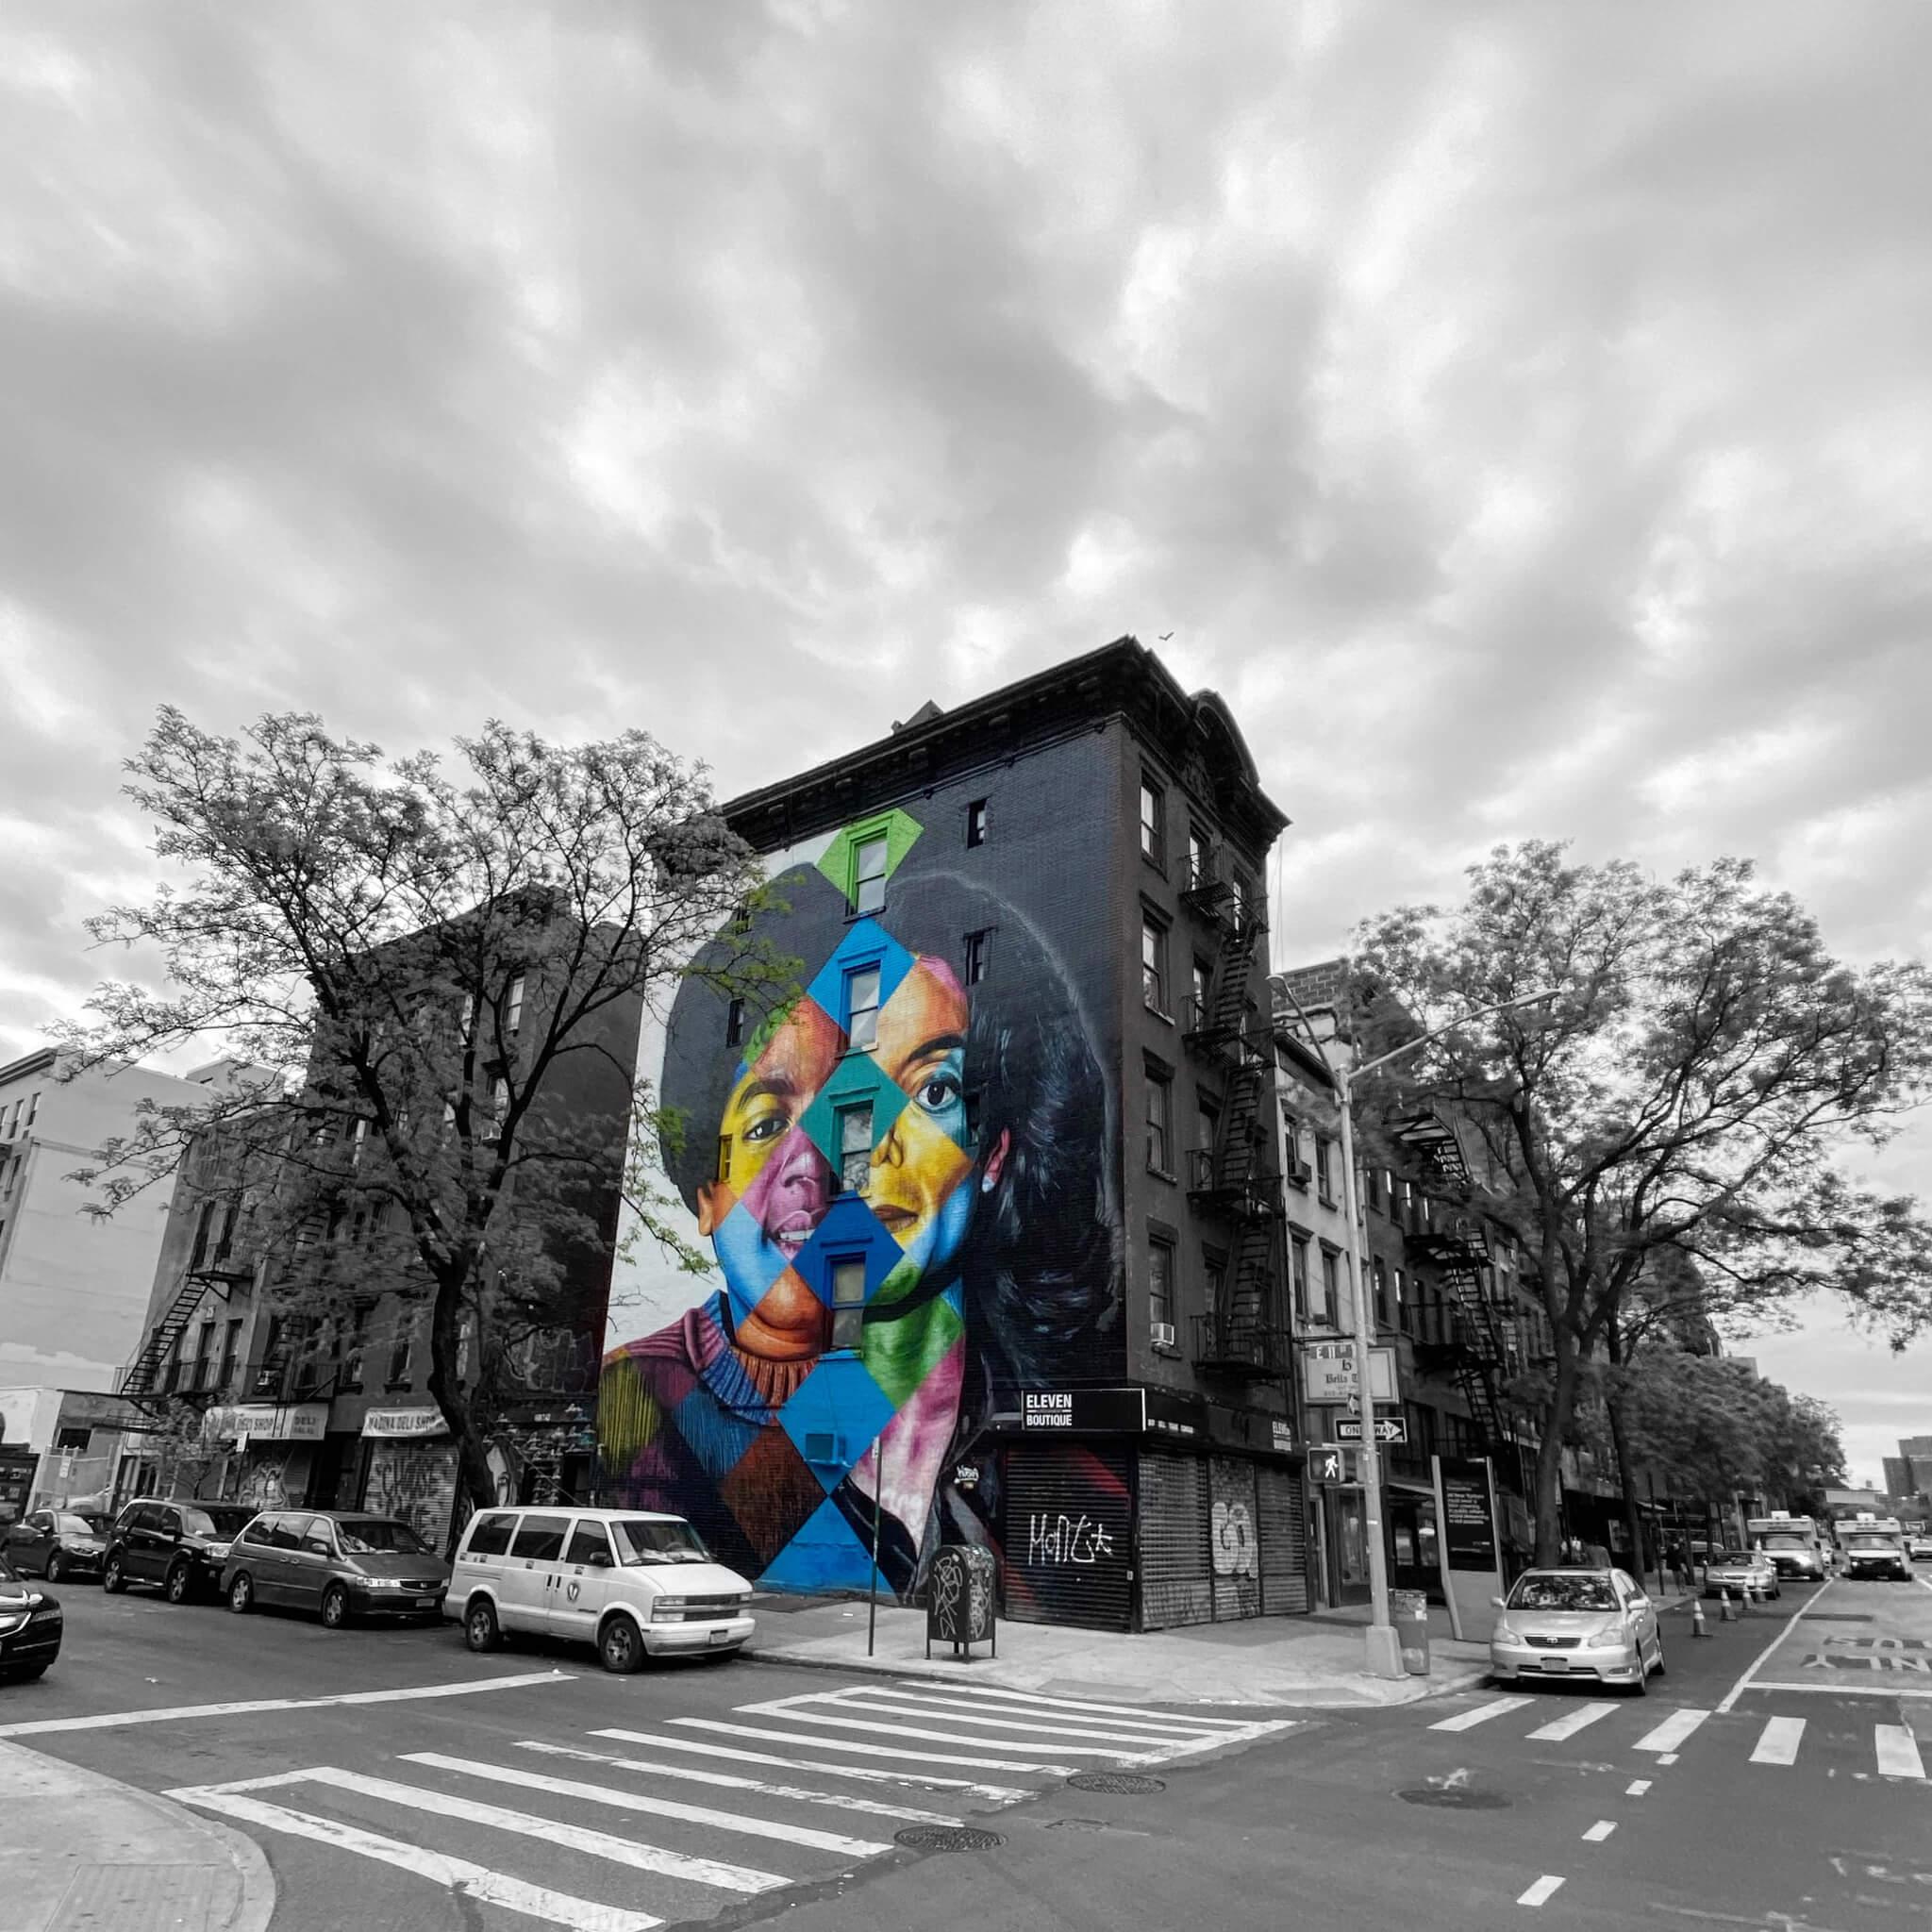 Monochrome Colour Pop - Street Art Photography by Sarah Sansom